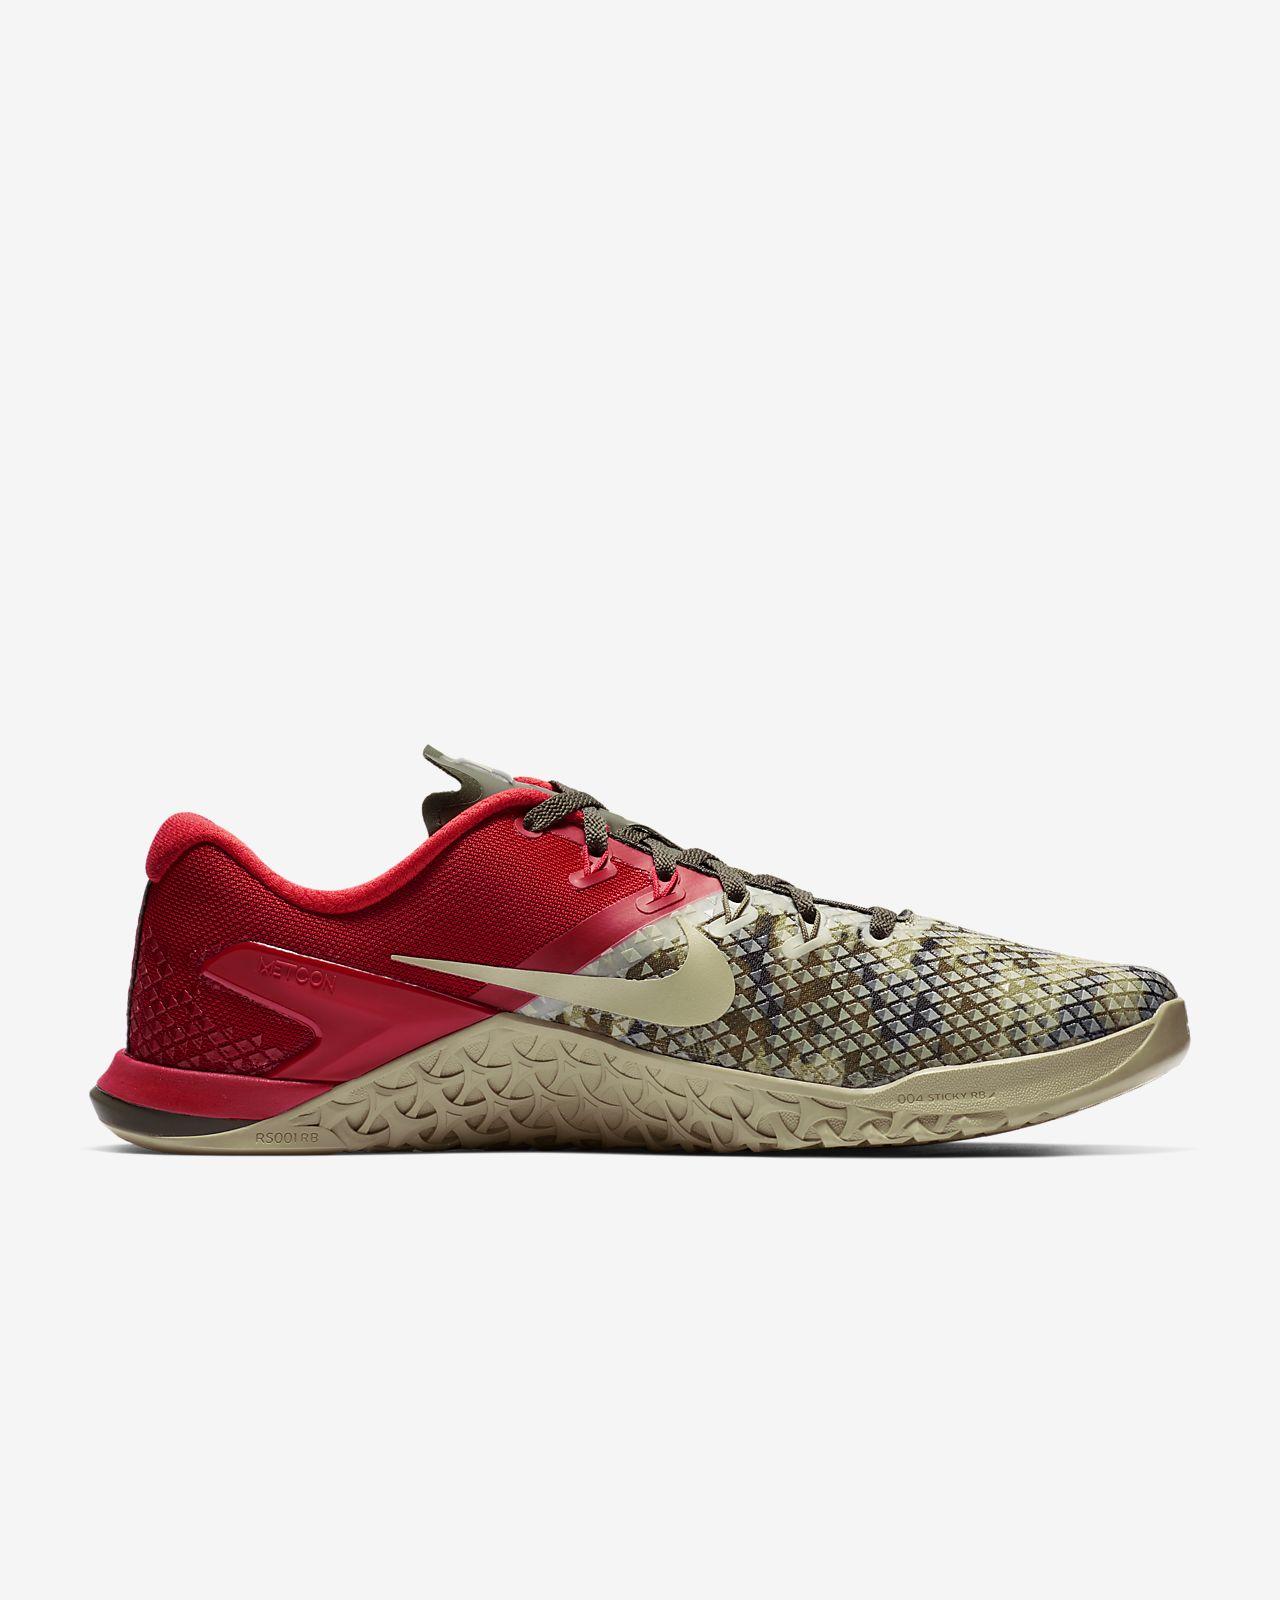 36a0fef8b3047 Nike Metcon 4 XD Men s Training Shoe. Nike.com